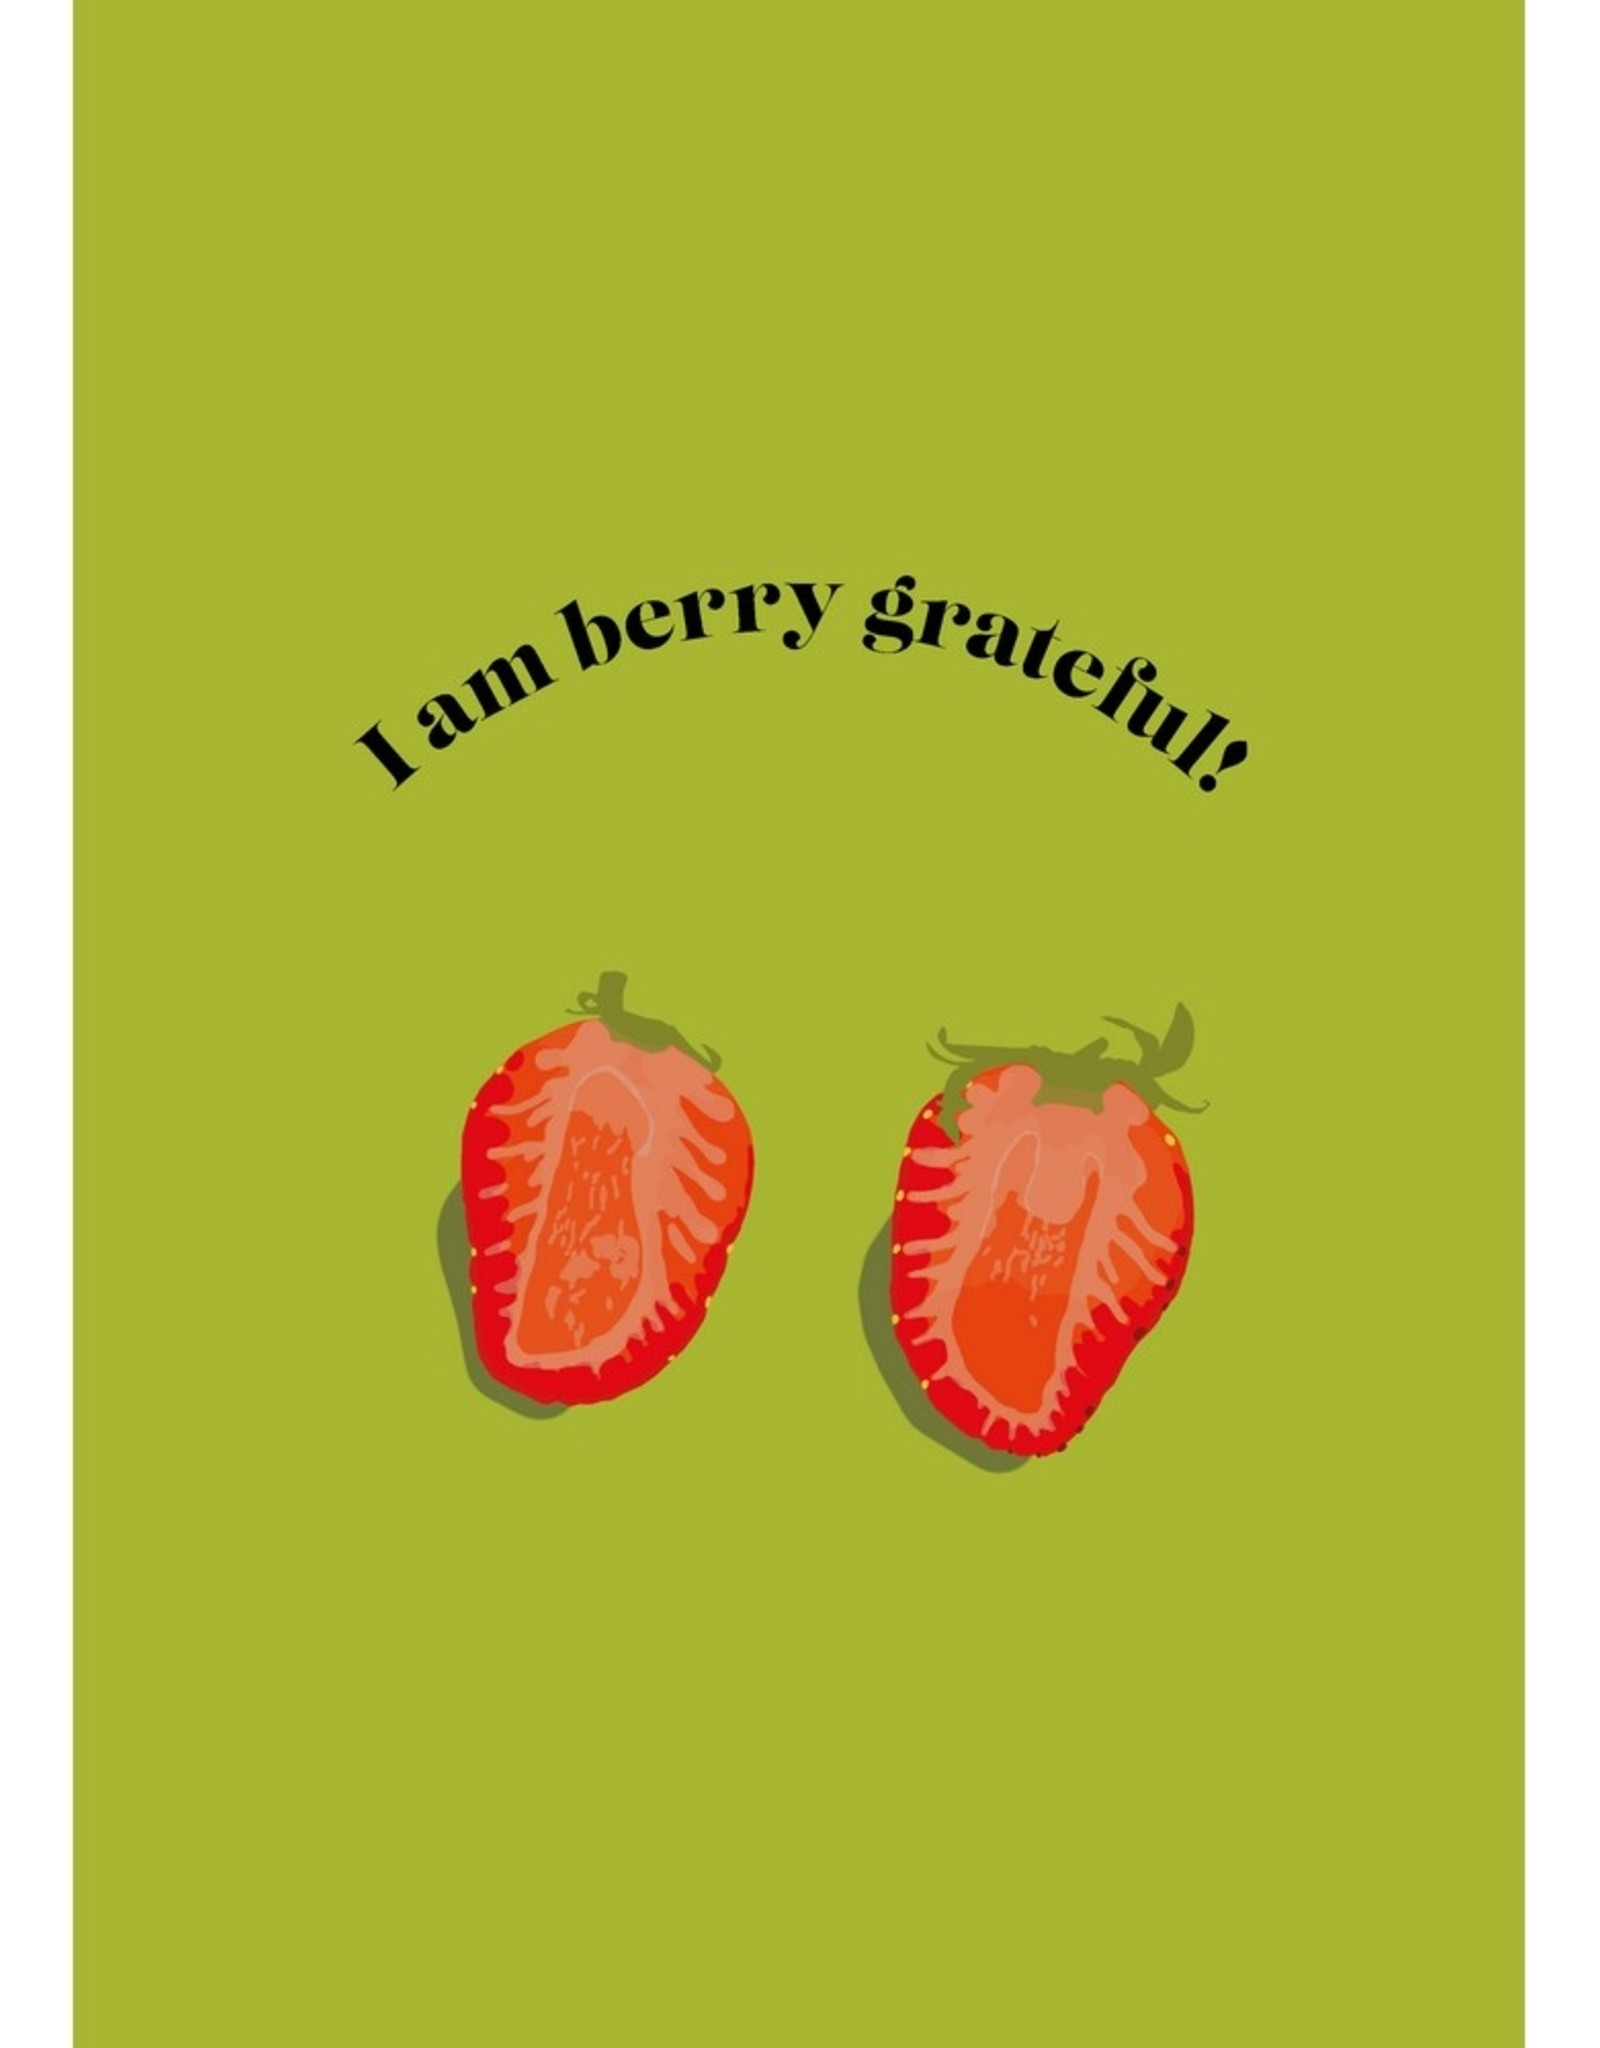 HAVA Creations Kaart met enveloppe Berry